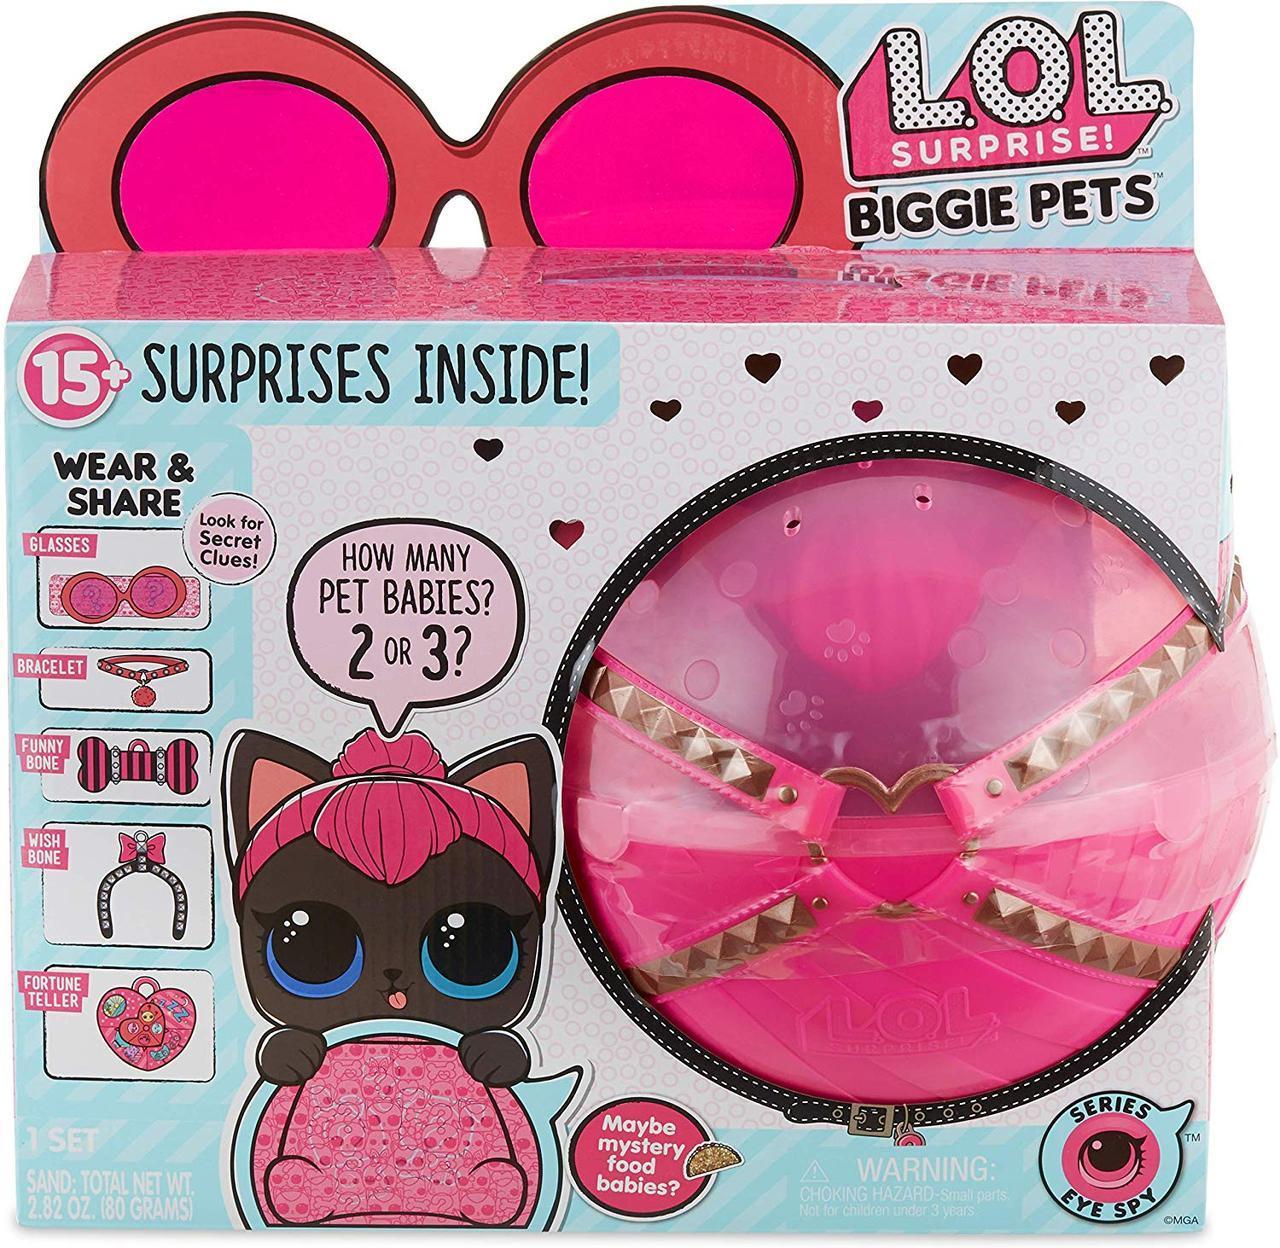 ЛОЛ Большой питомец Спайси Китти L.O.L. Surprise! Biggie Pet Spicy Kitty